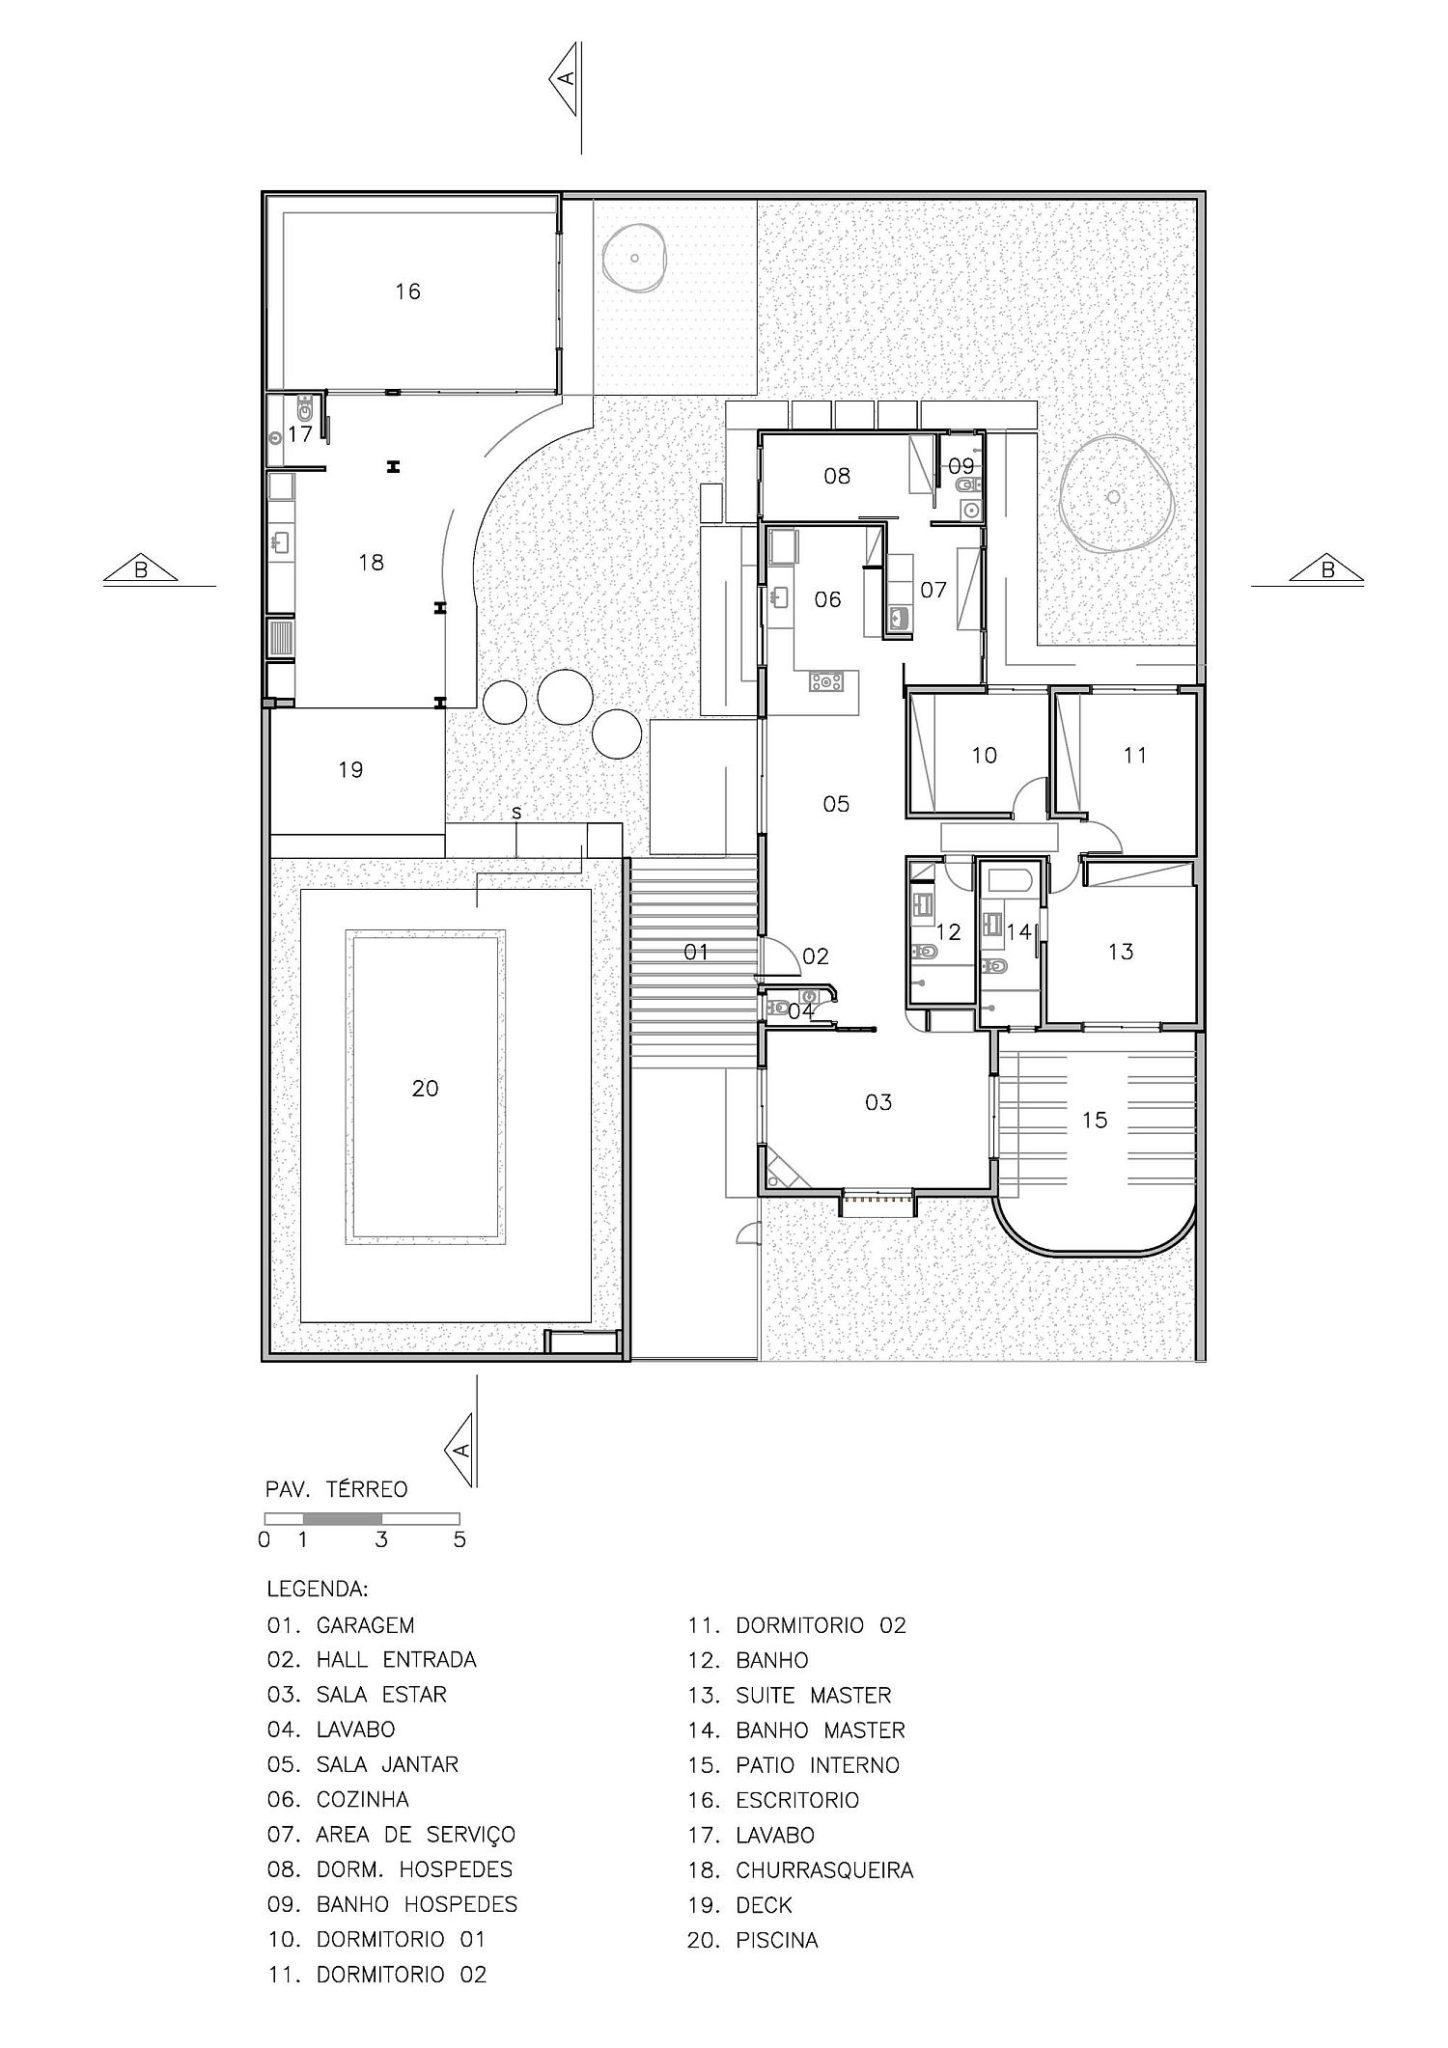 Floor plan of Barão Geraldo Residence